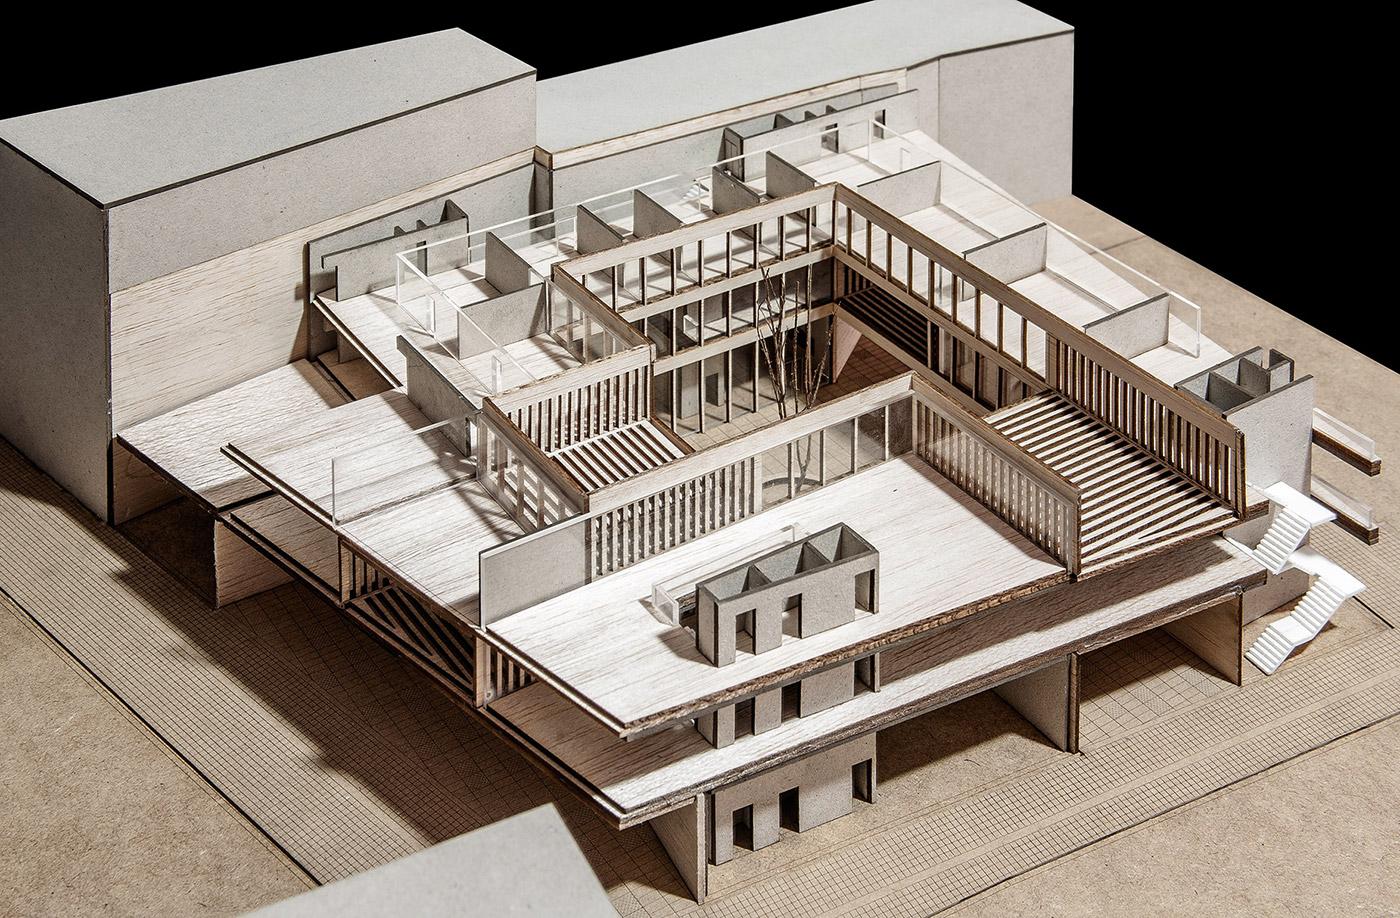 maqueta-arquitectura-architecture model-valencia-maqueta-pfc-Biblioteca-arquimaqueta-(2)